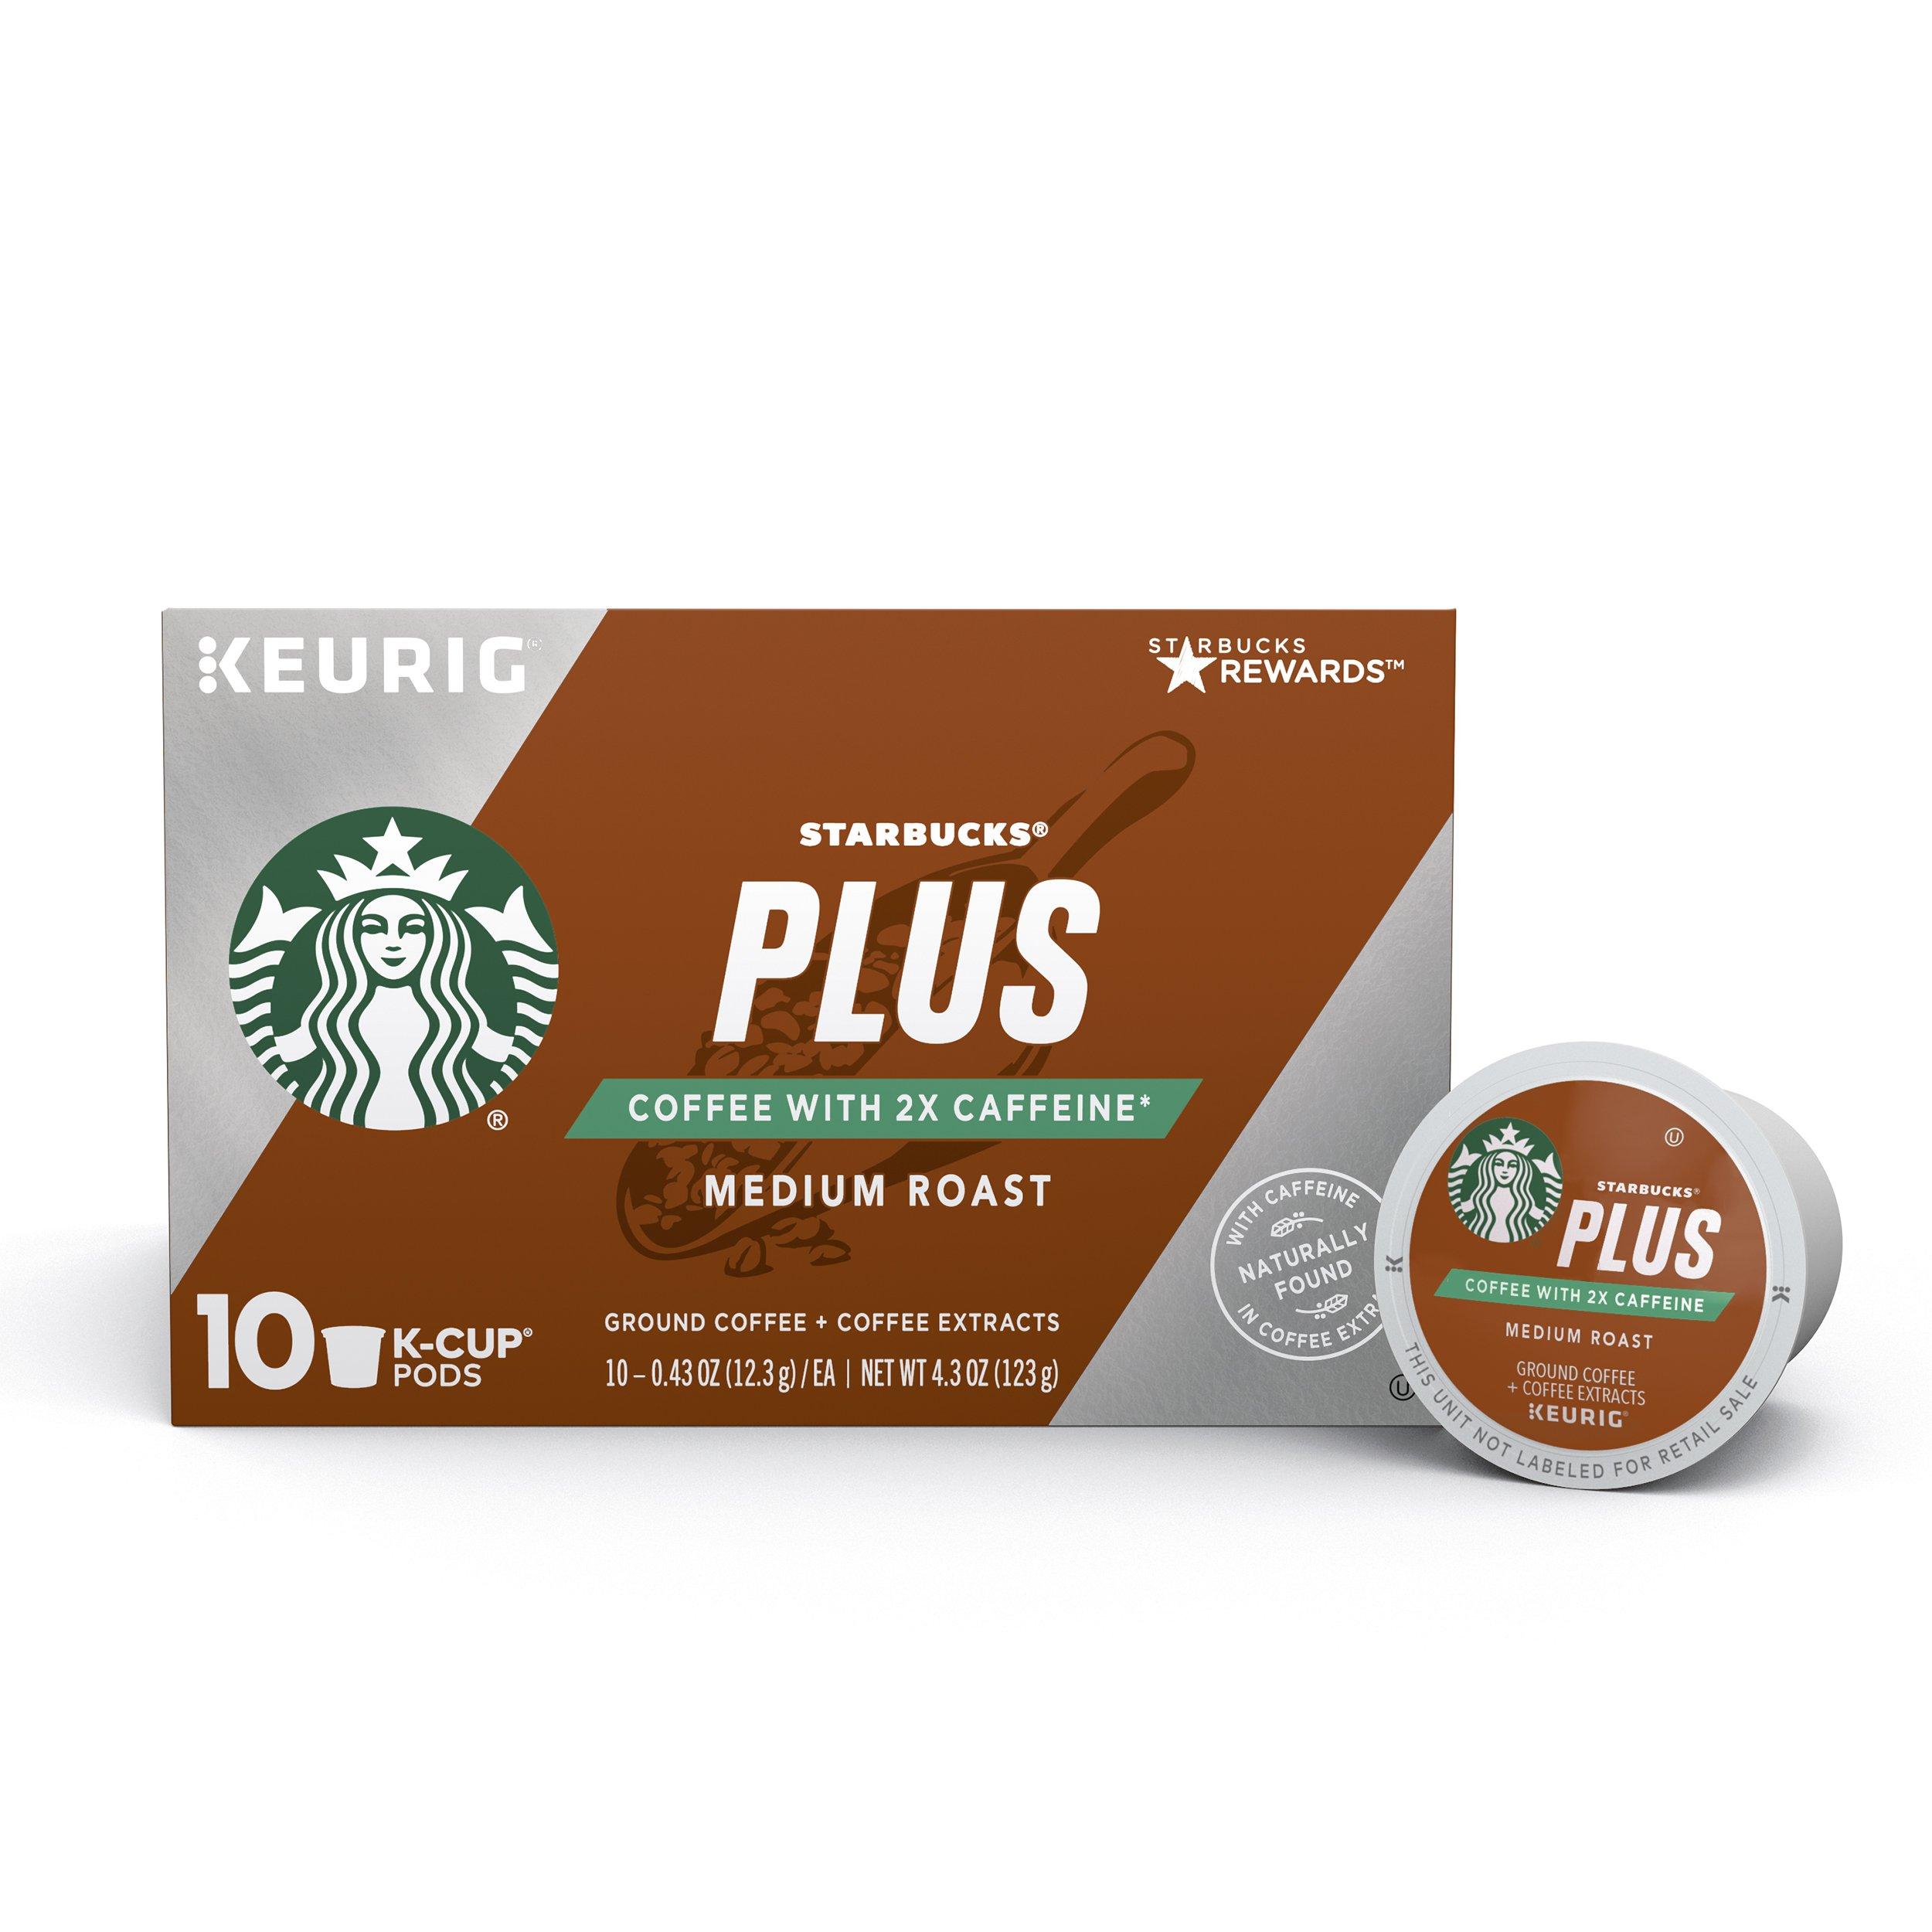 Amazon.com : Starbucks Plus Coffee 2X Caffeine Dark Roast Single Cup ...